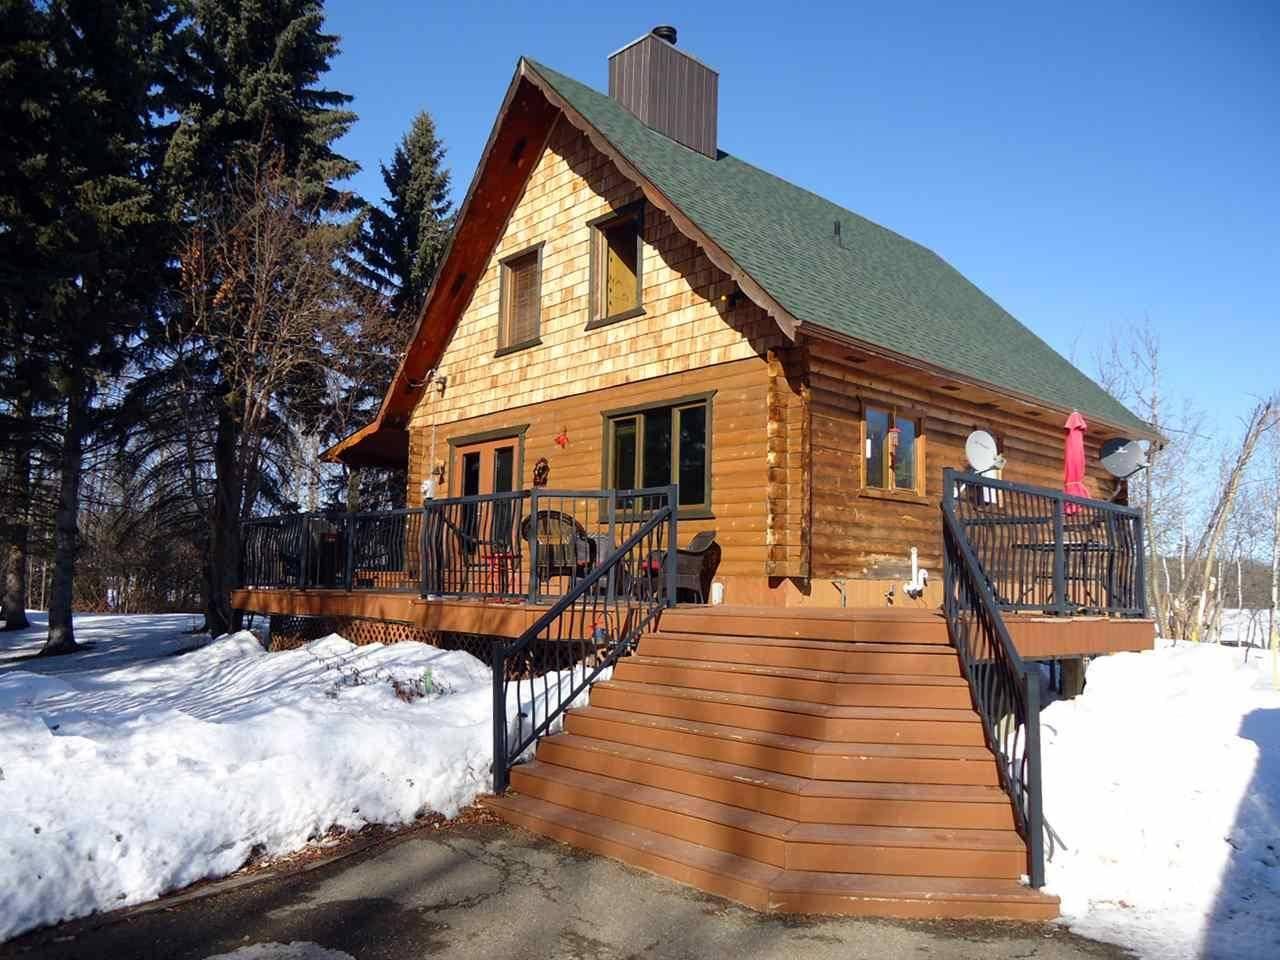 Buliding: 22106 Lake Road South, Rural Strathcona County, AB